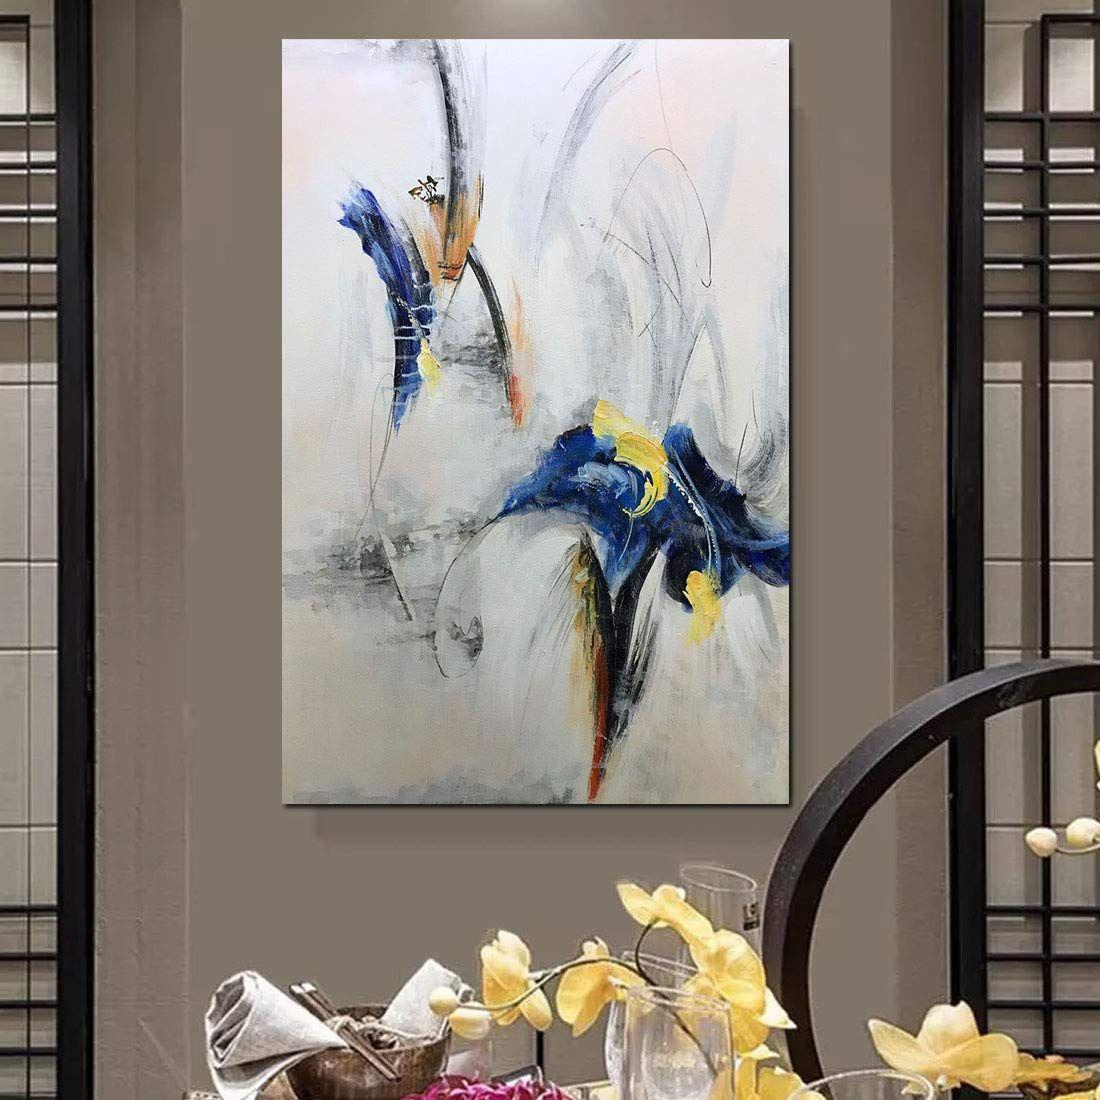 Metuu Oil Paintings 24x36 Inch Texture Palette Knife